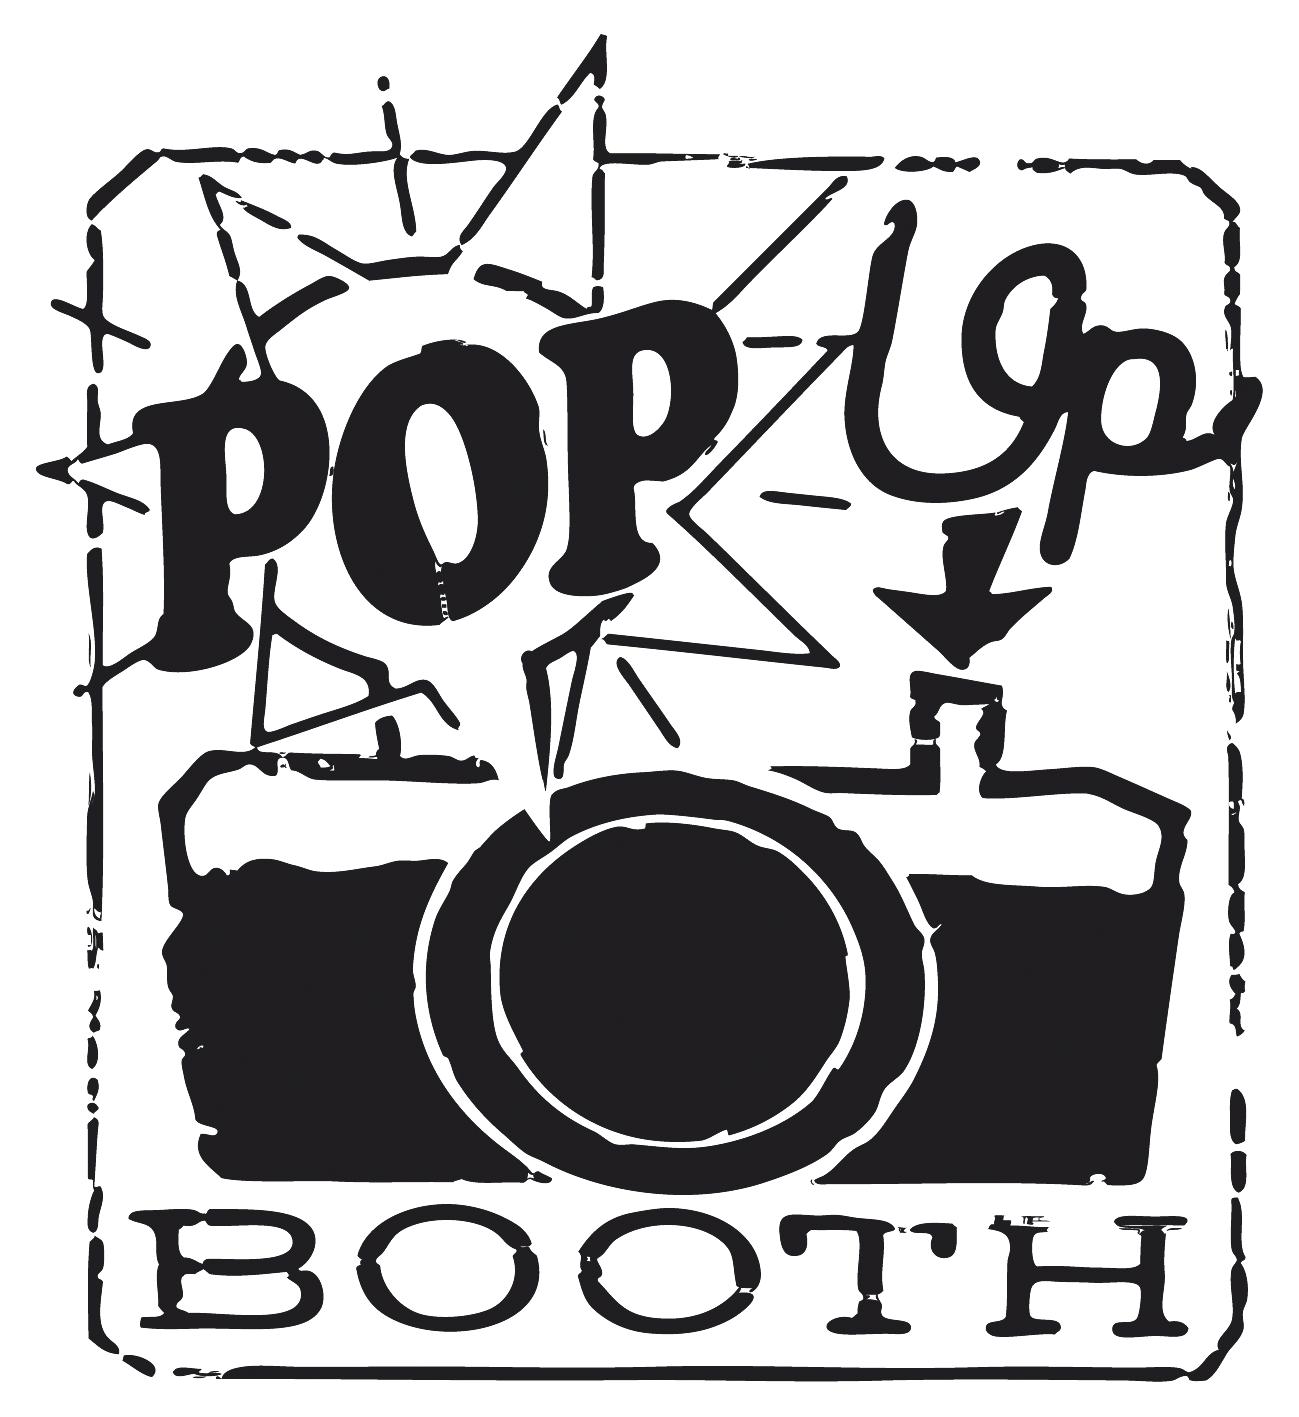 photobooth en foodtruck, voorstel